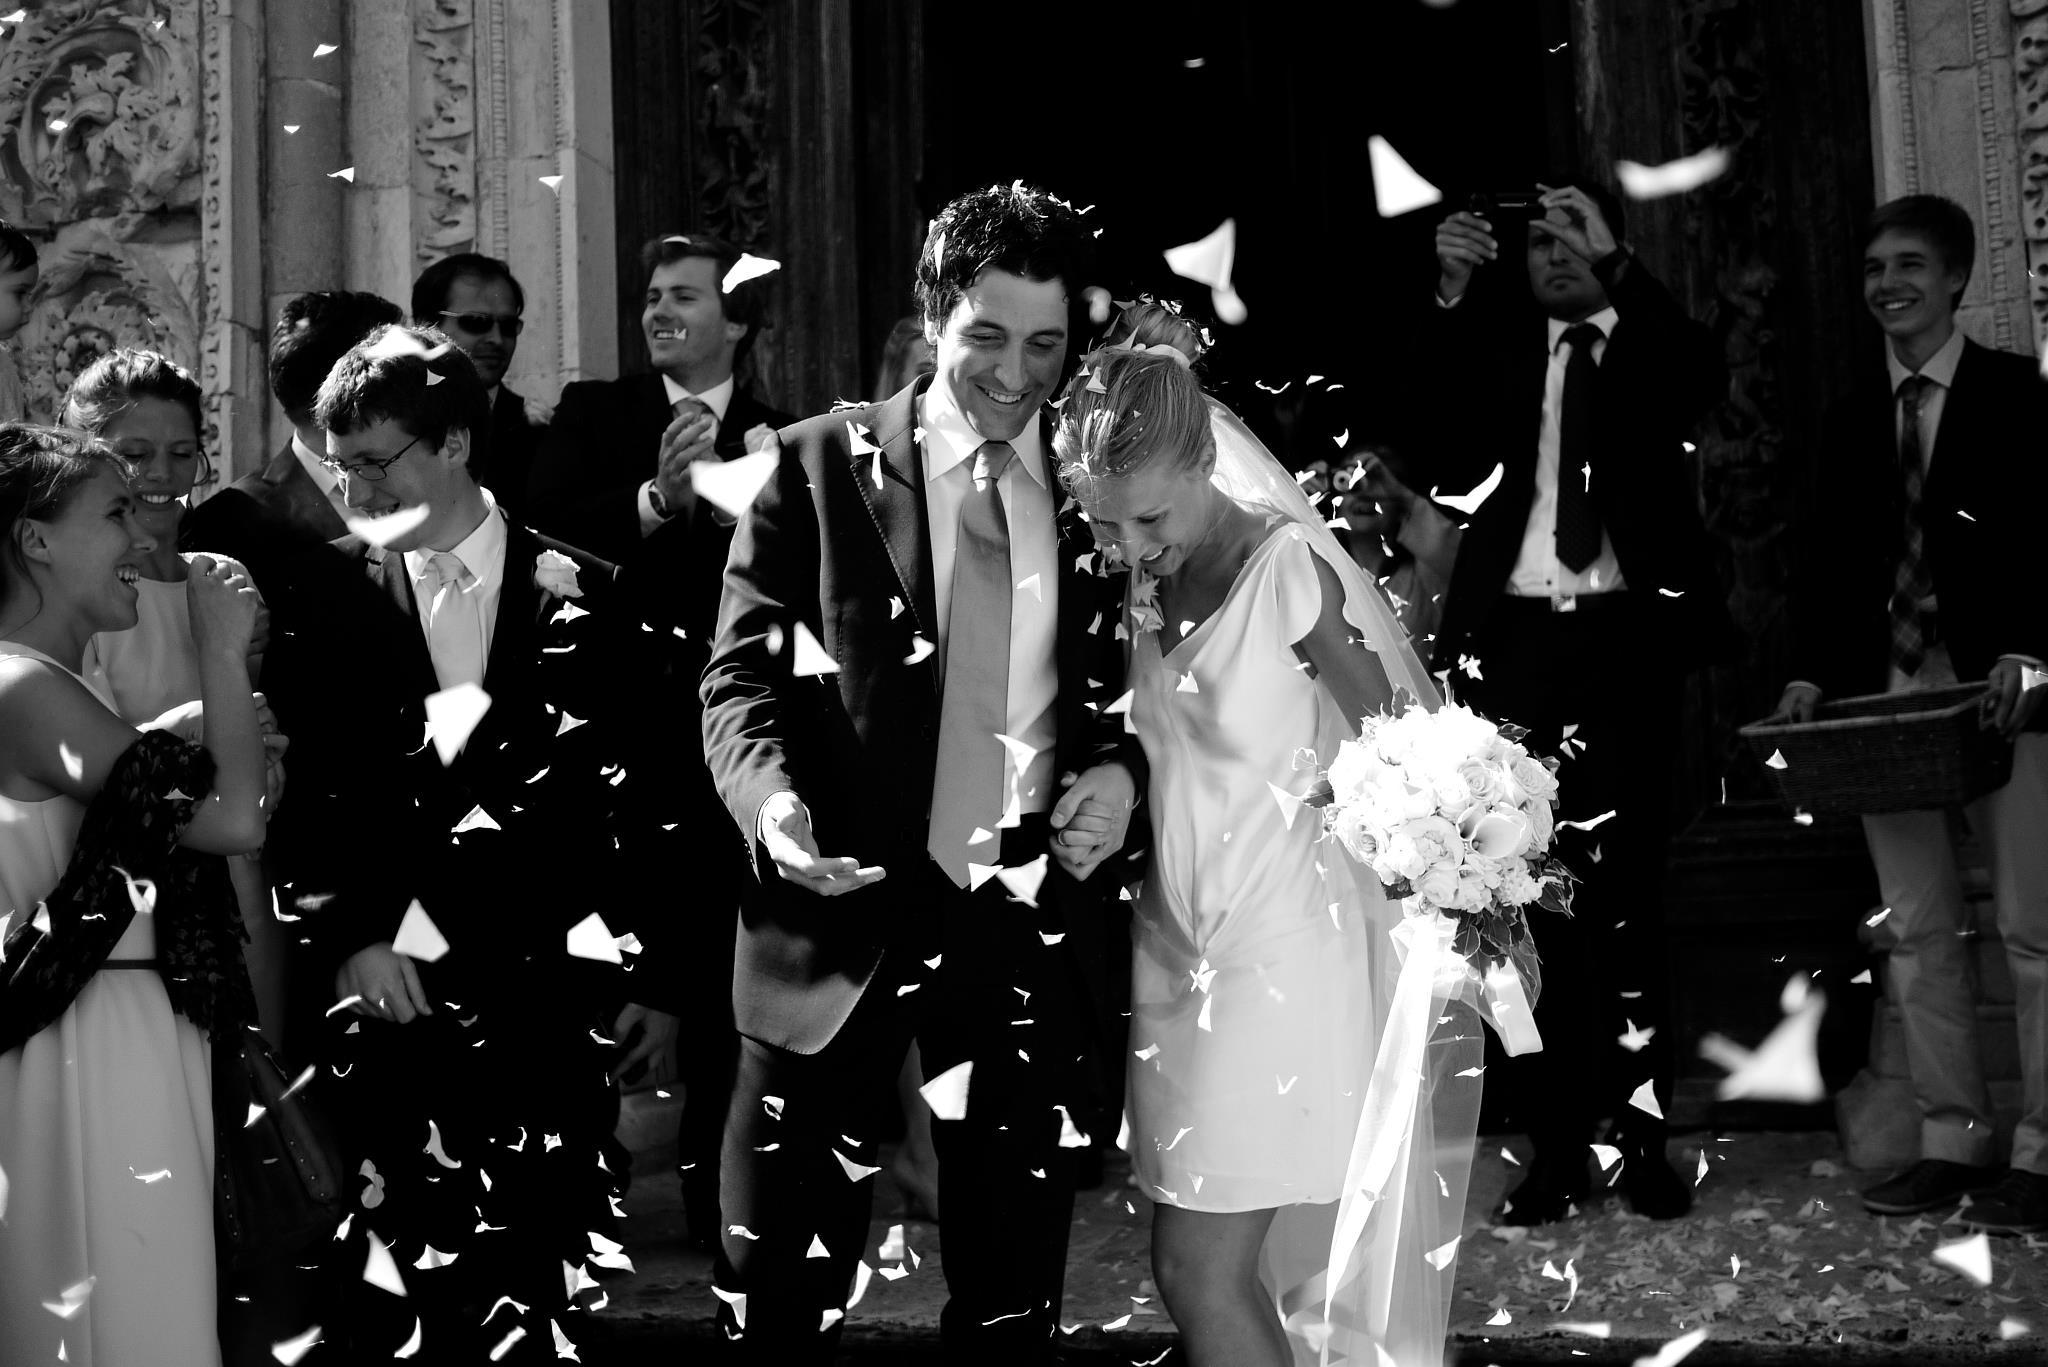 Mon mariage en Italie : la semaine avant le mariage